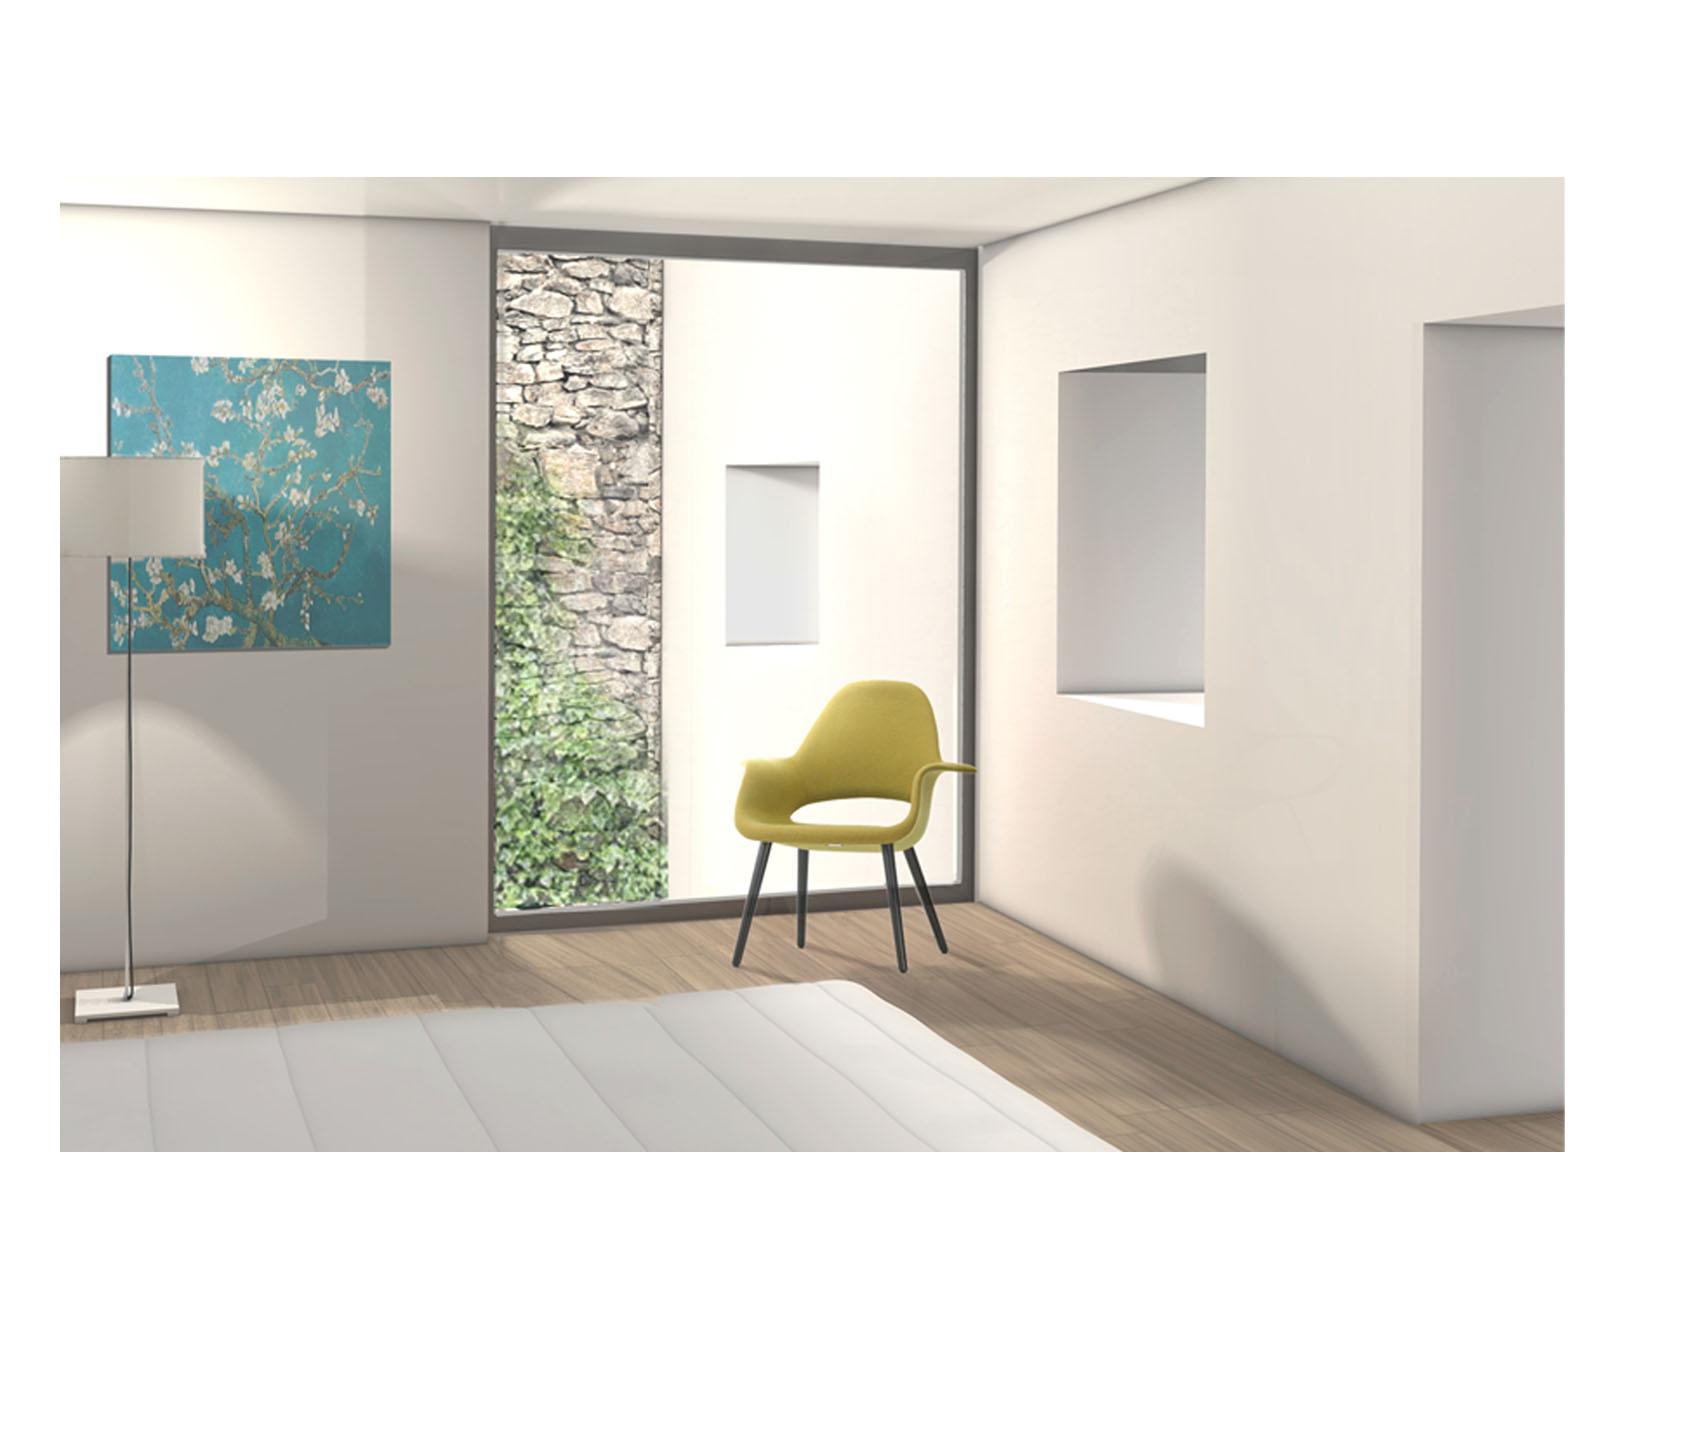 Private House-Celorio-Image 03.jpg